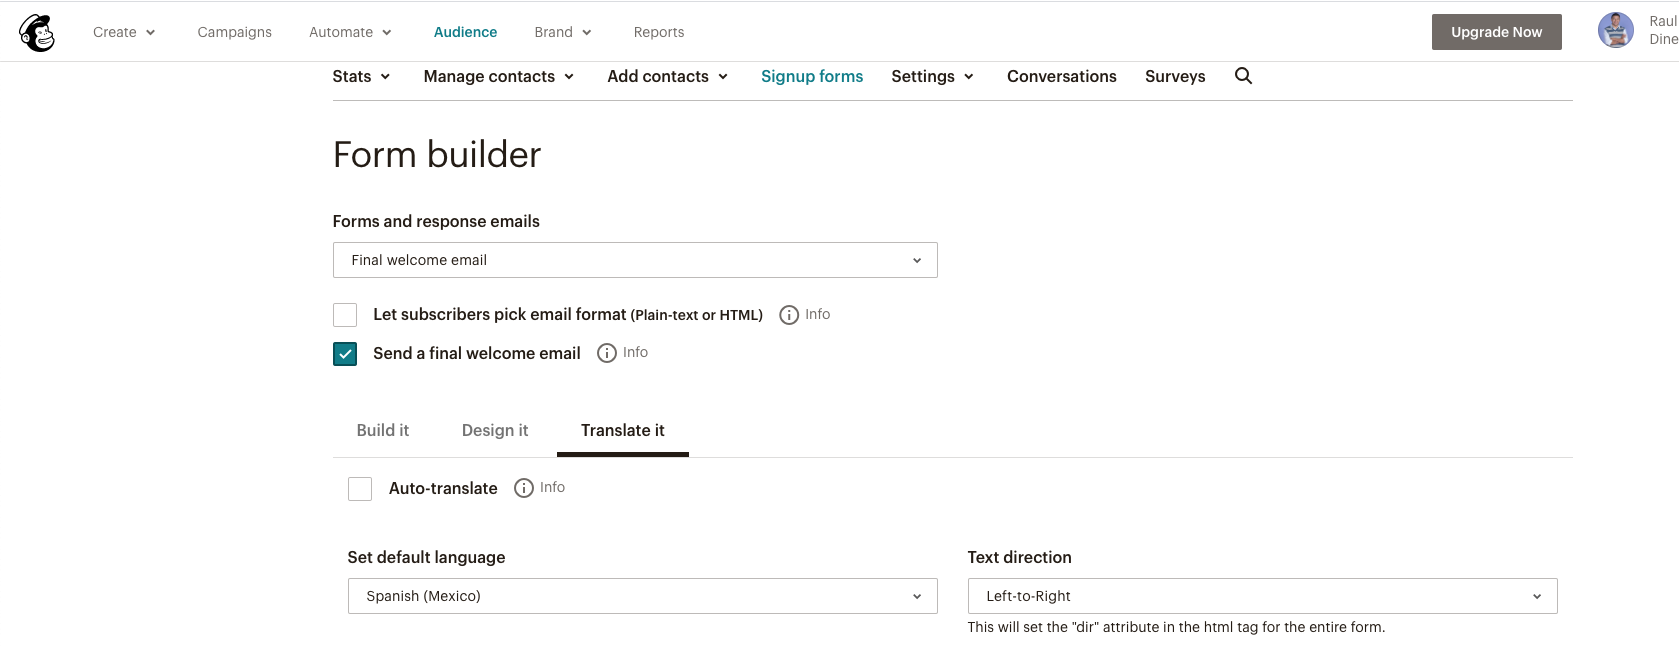 imagen de los ajustes del form builder form mailchimp